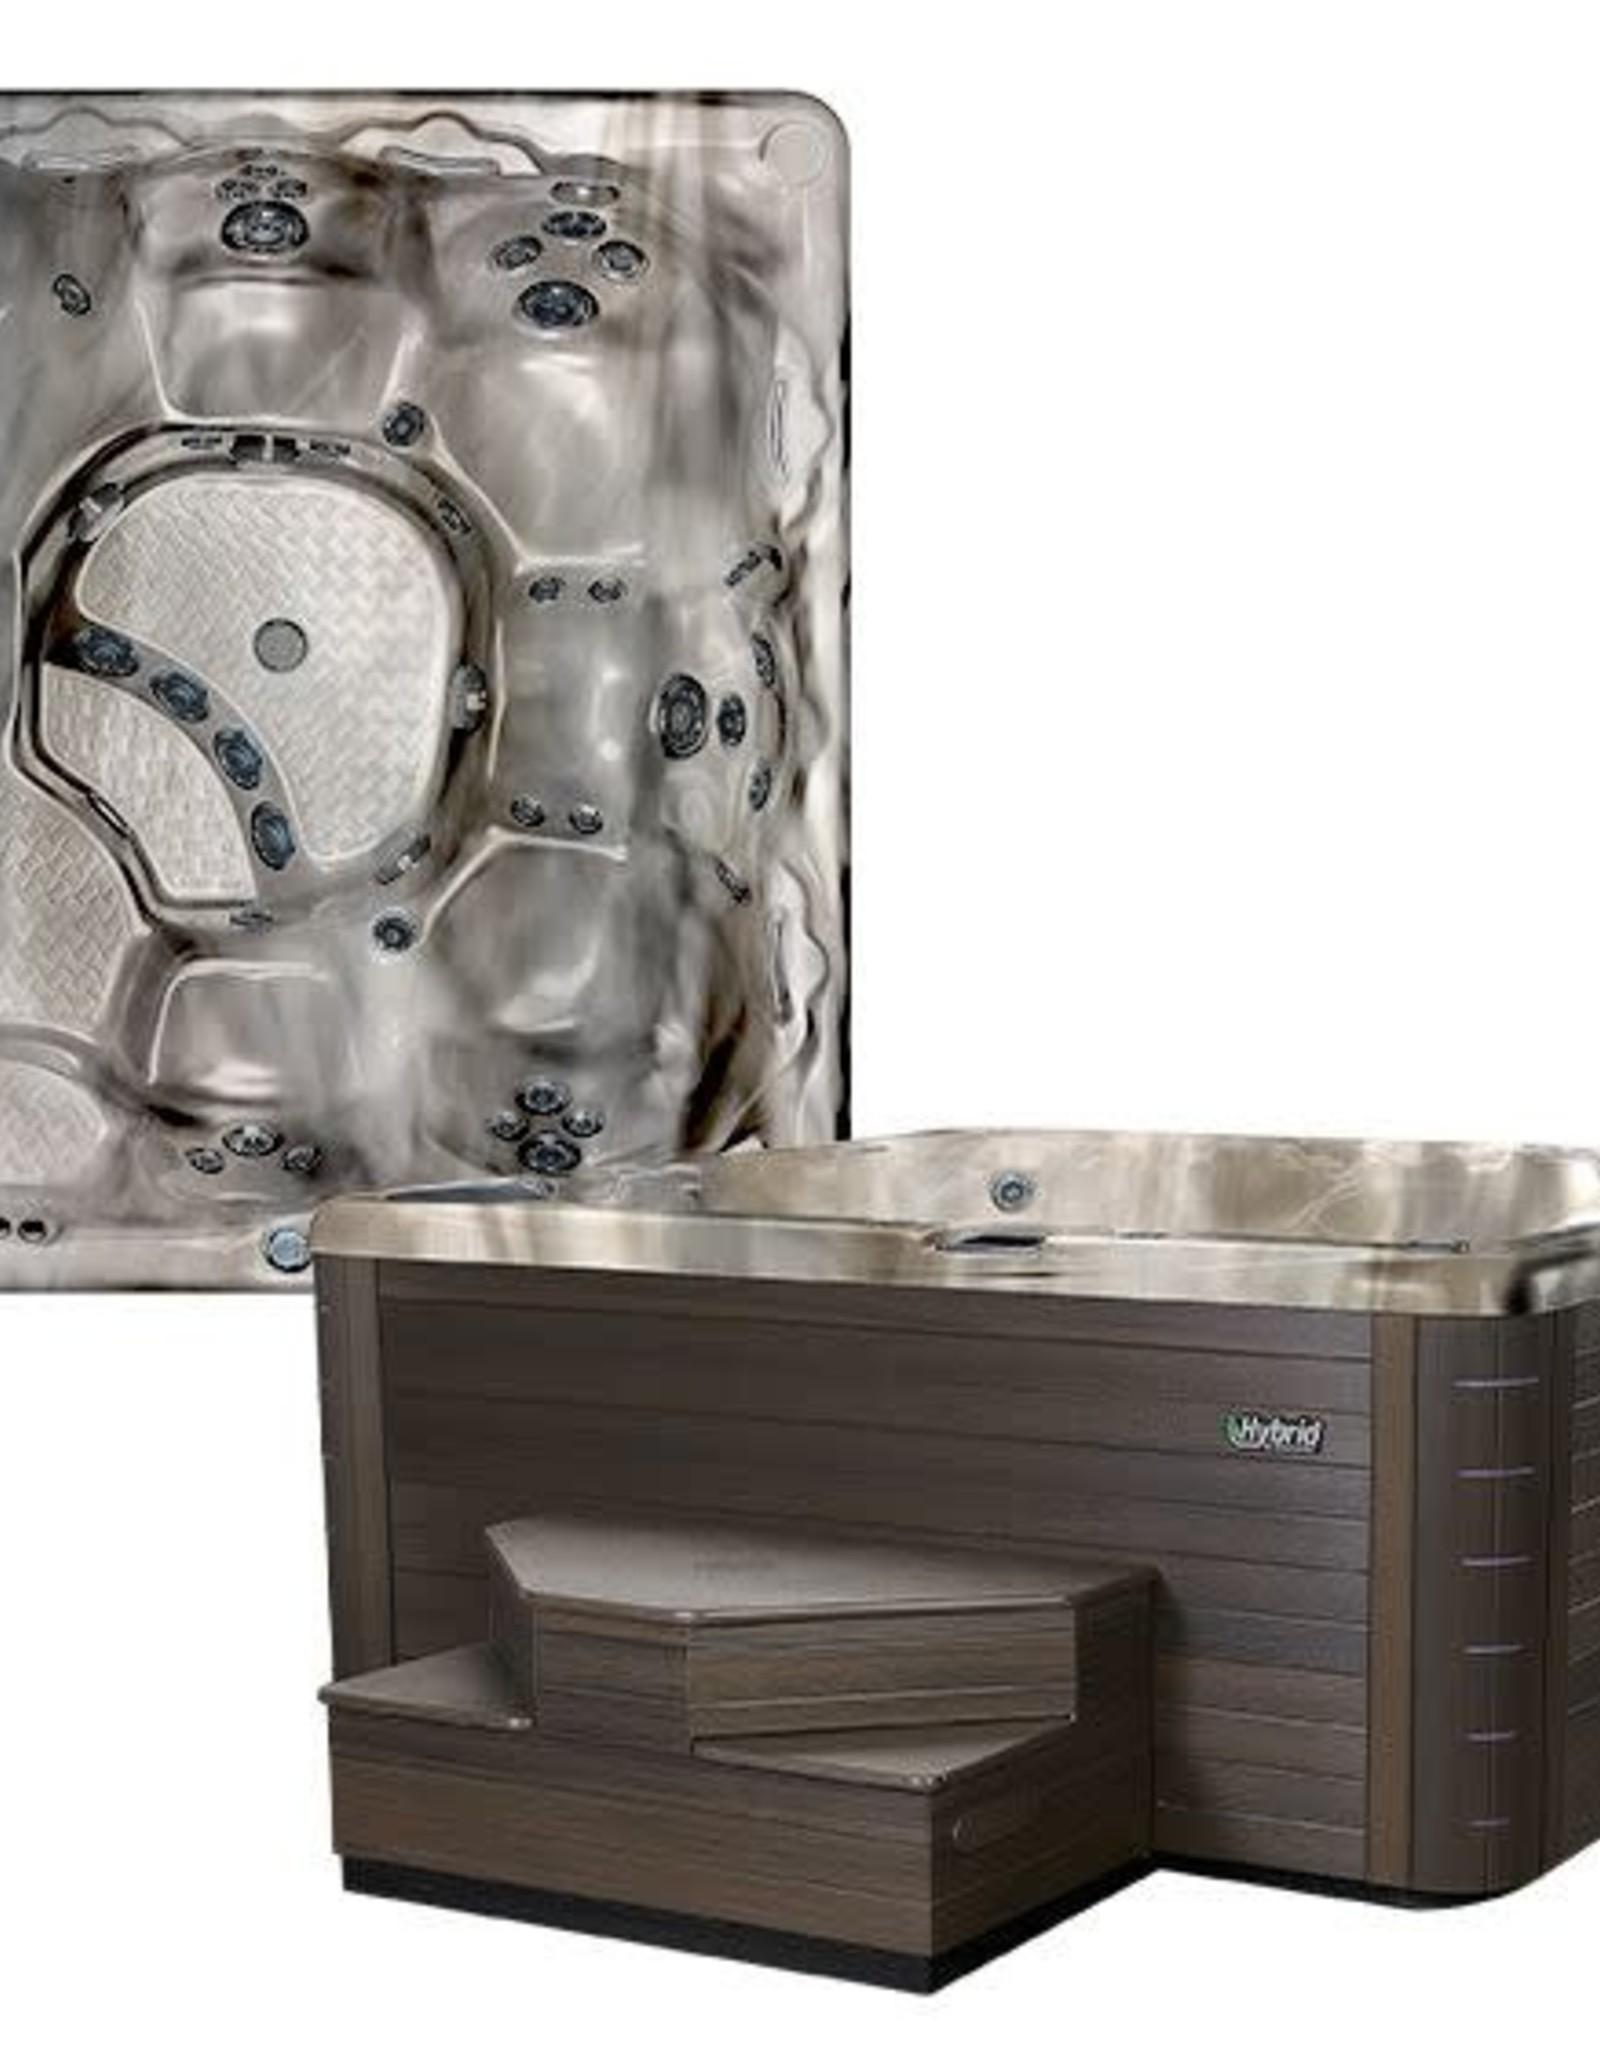 BEACHCOMBER BEACHCOMBER - MODEL 750 HYBRID4®